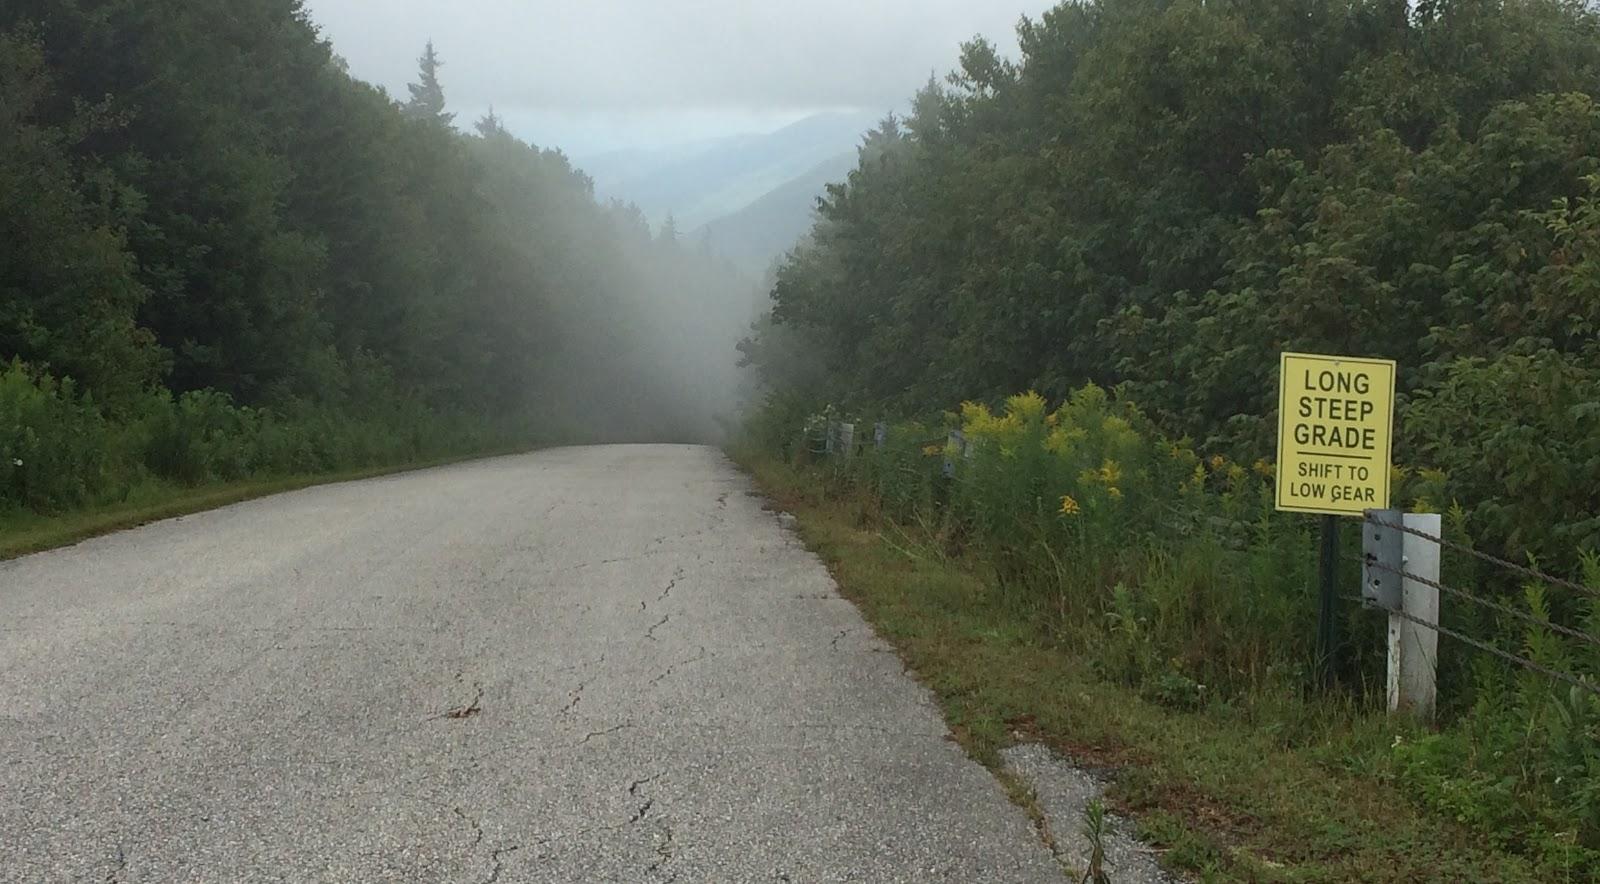 Mt. Equinox bike climb - steep road sign